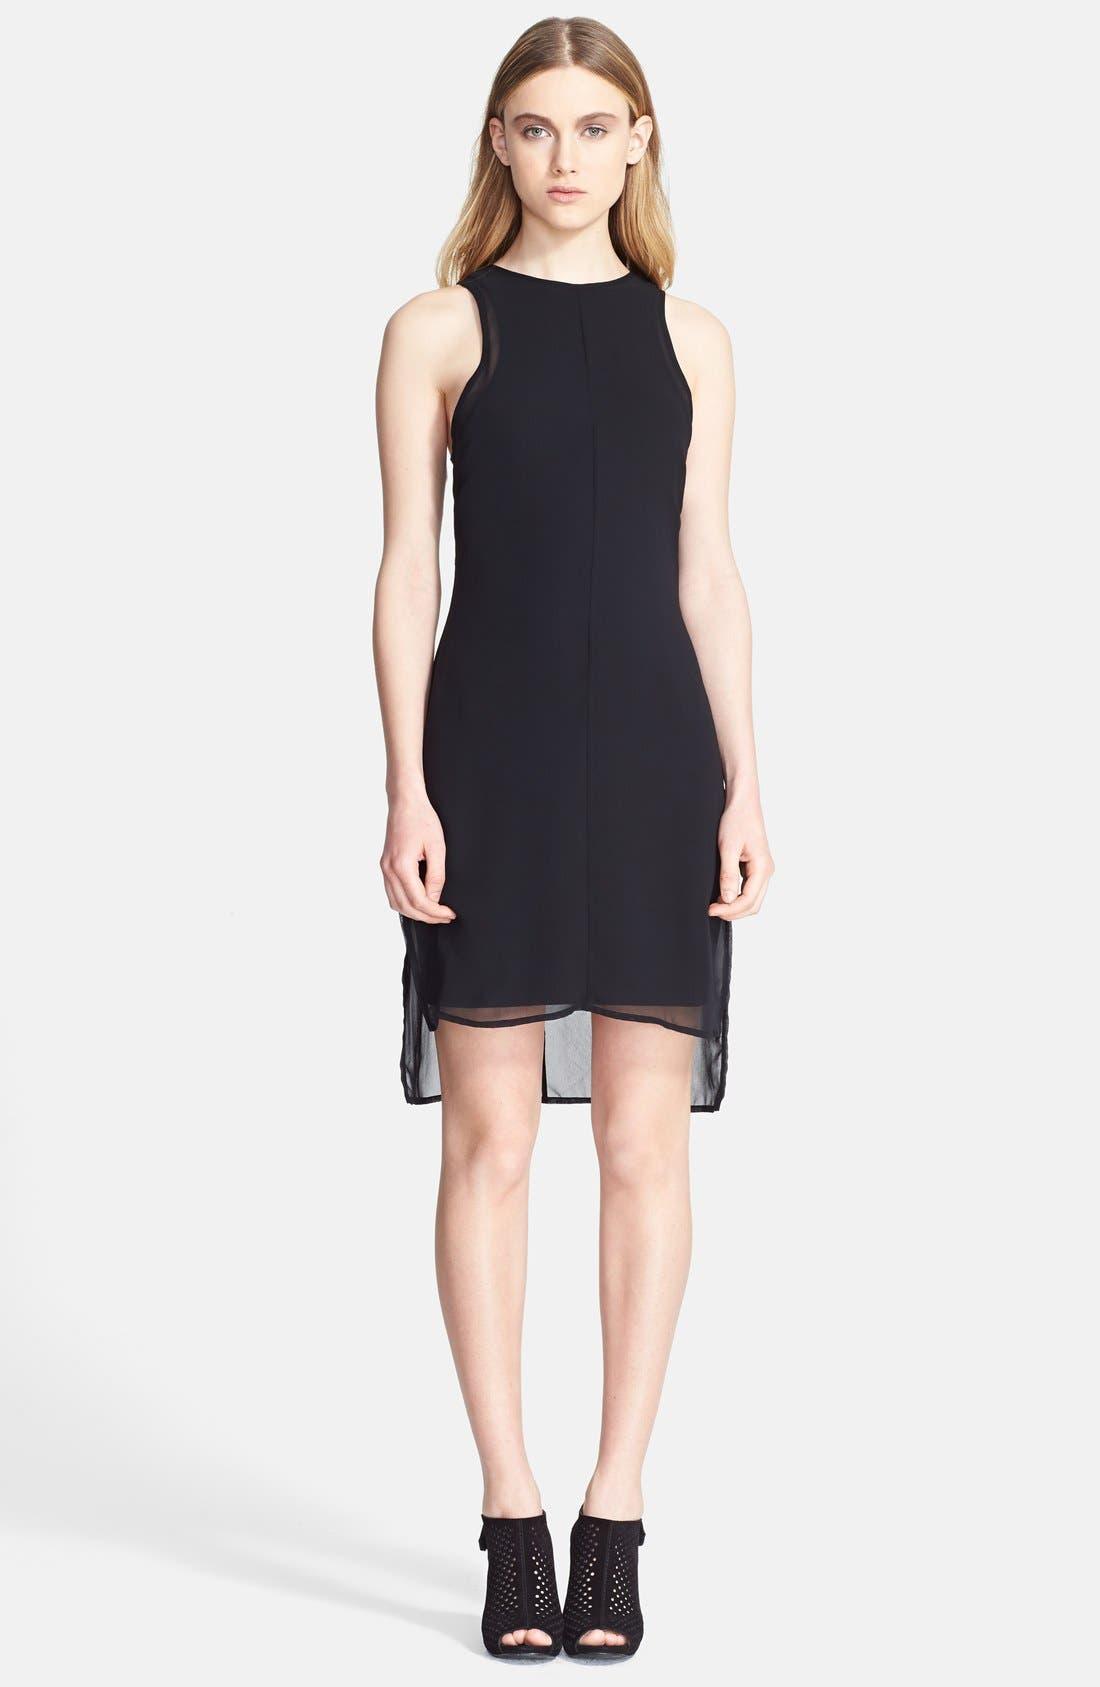 Alternate Image 1 Selected - rag & bone 'Bailey' Chiffon High/Low Dress